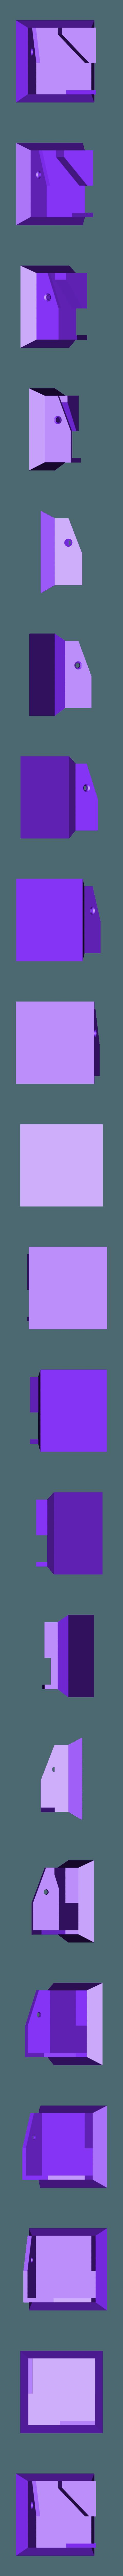 pied profil 20 20 por devidoir.stl Download STL file foot profile 20/20 • 3D print model, ced57